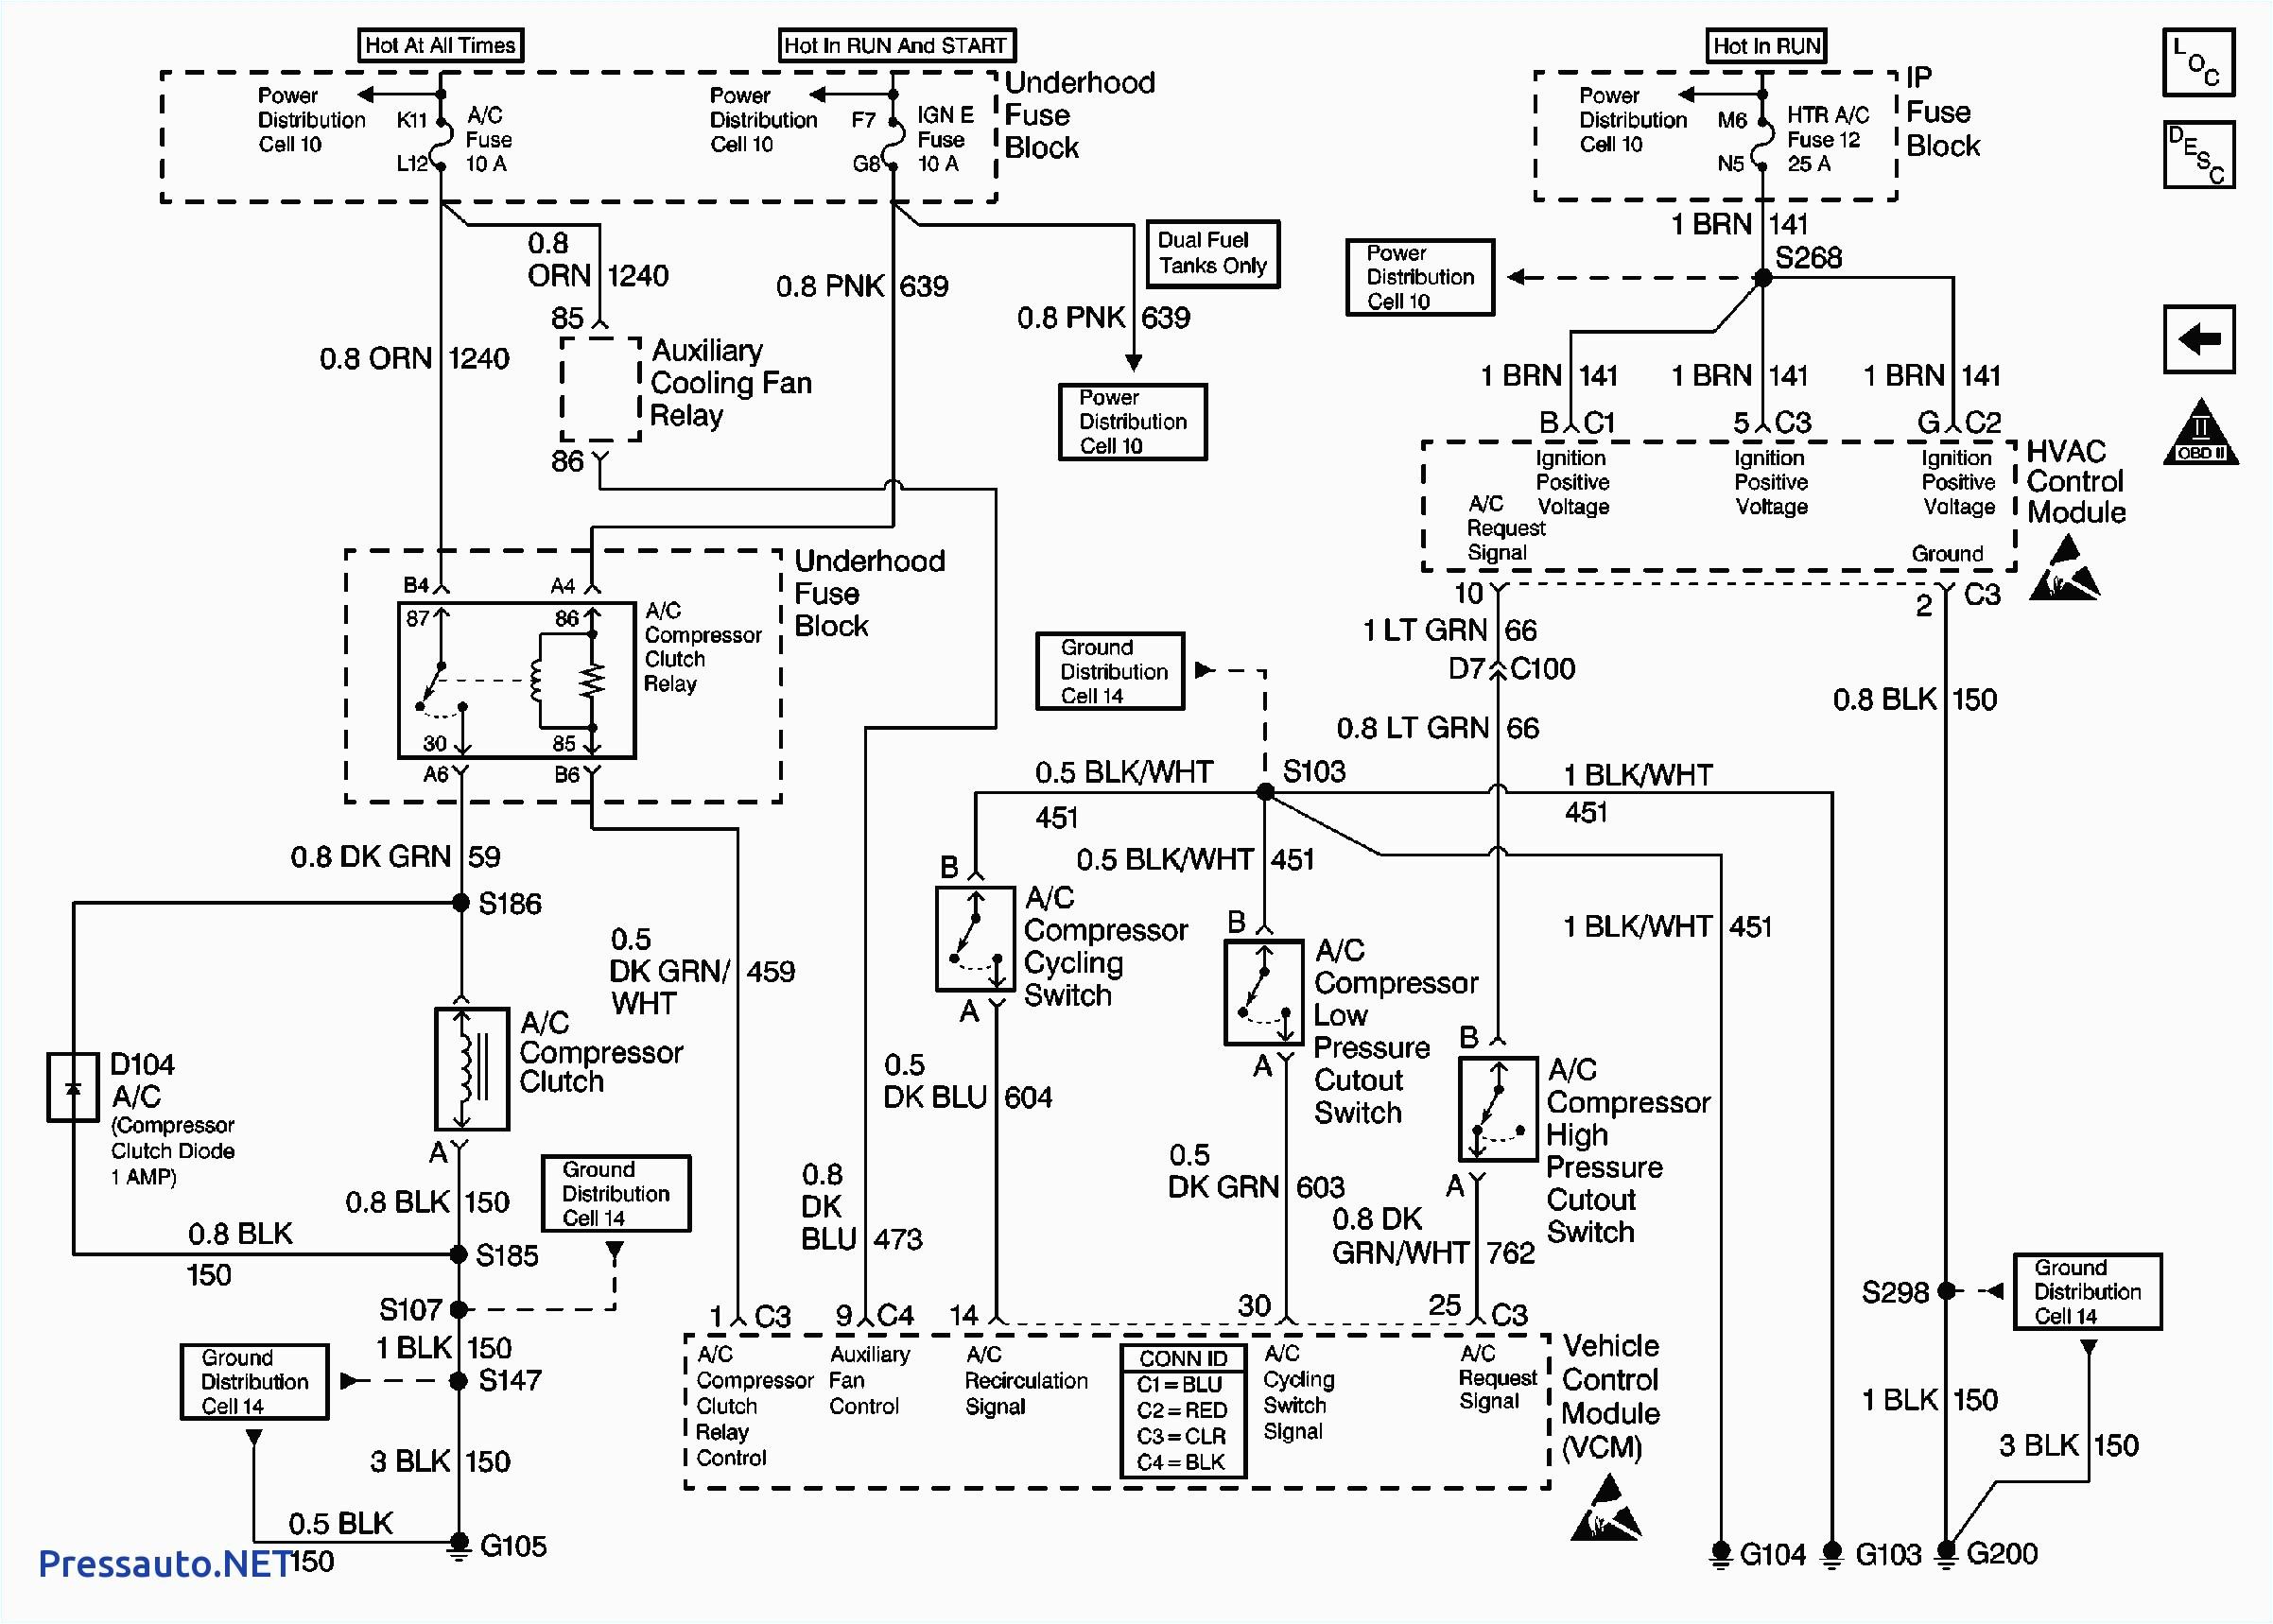 2009 freightliner m2 wiring diagram wiring diagram database 2006 freightliner m2 ac wiring diagram 2006 freightliner m2 wiring diagram